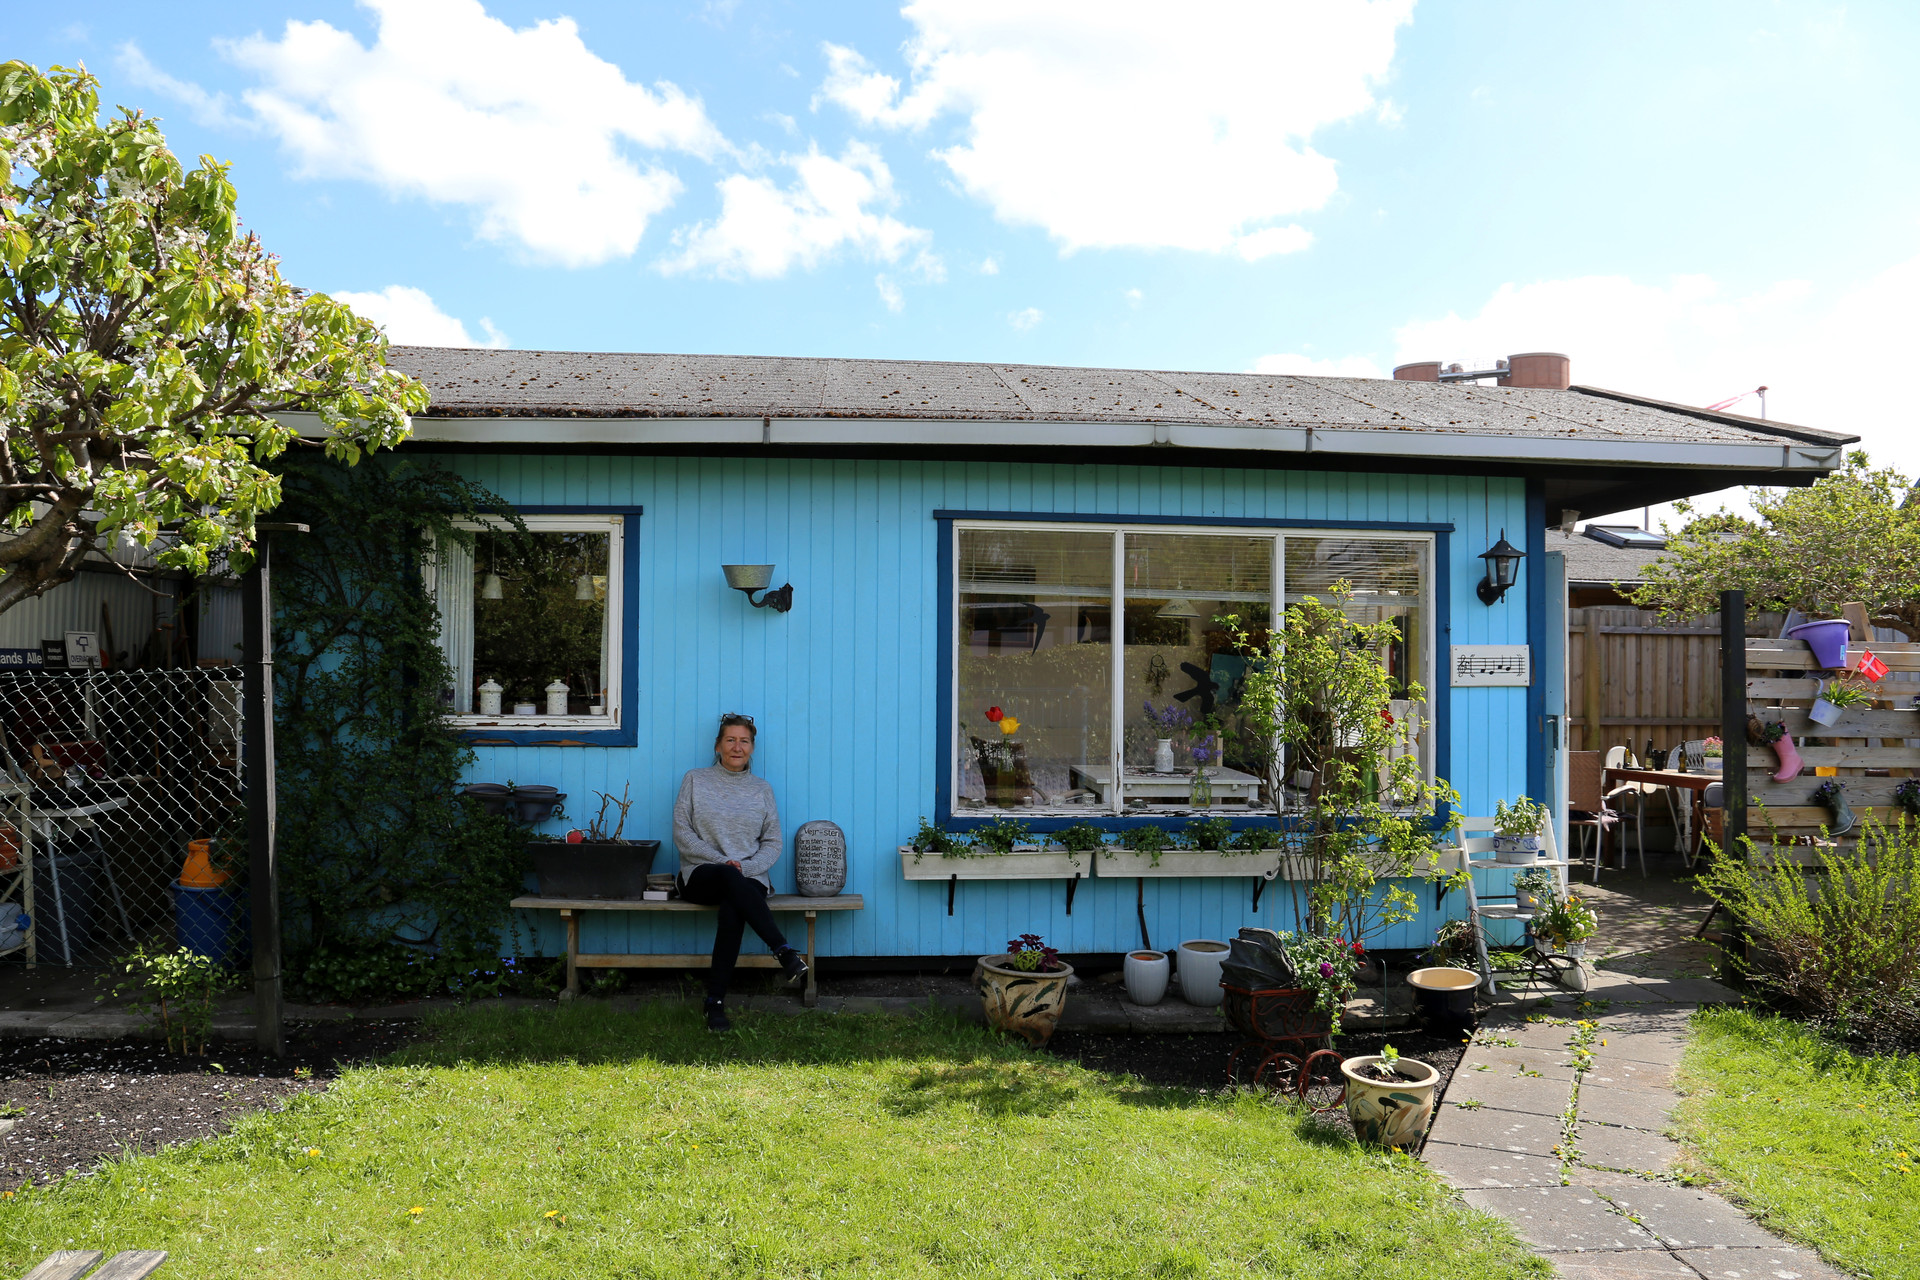 Karin Norgreen Larsen foran sit kolonihavehus i haveforeningen Vennelyst.